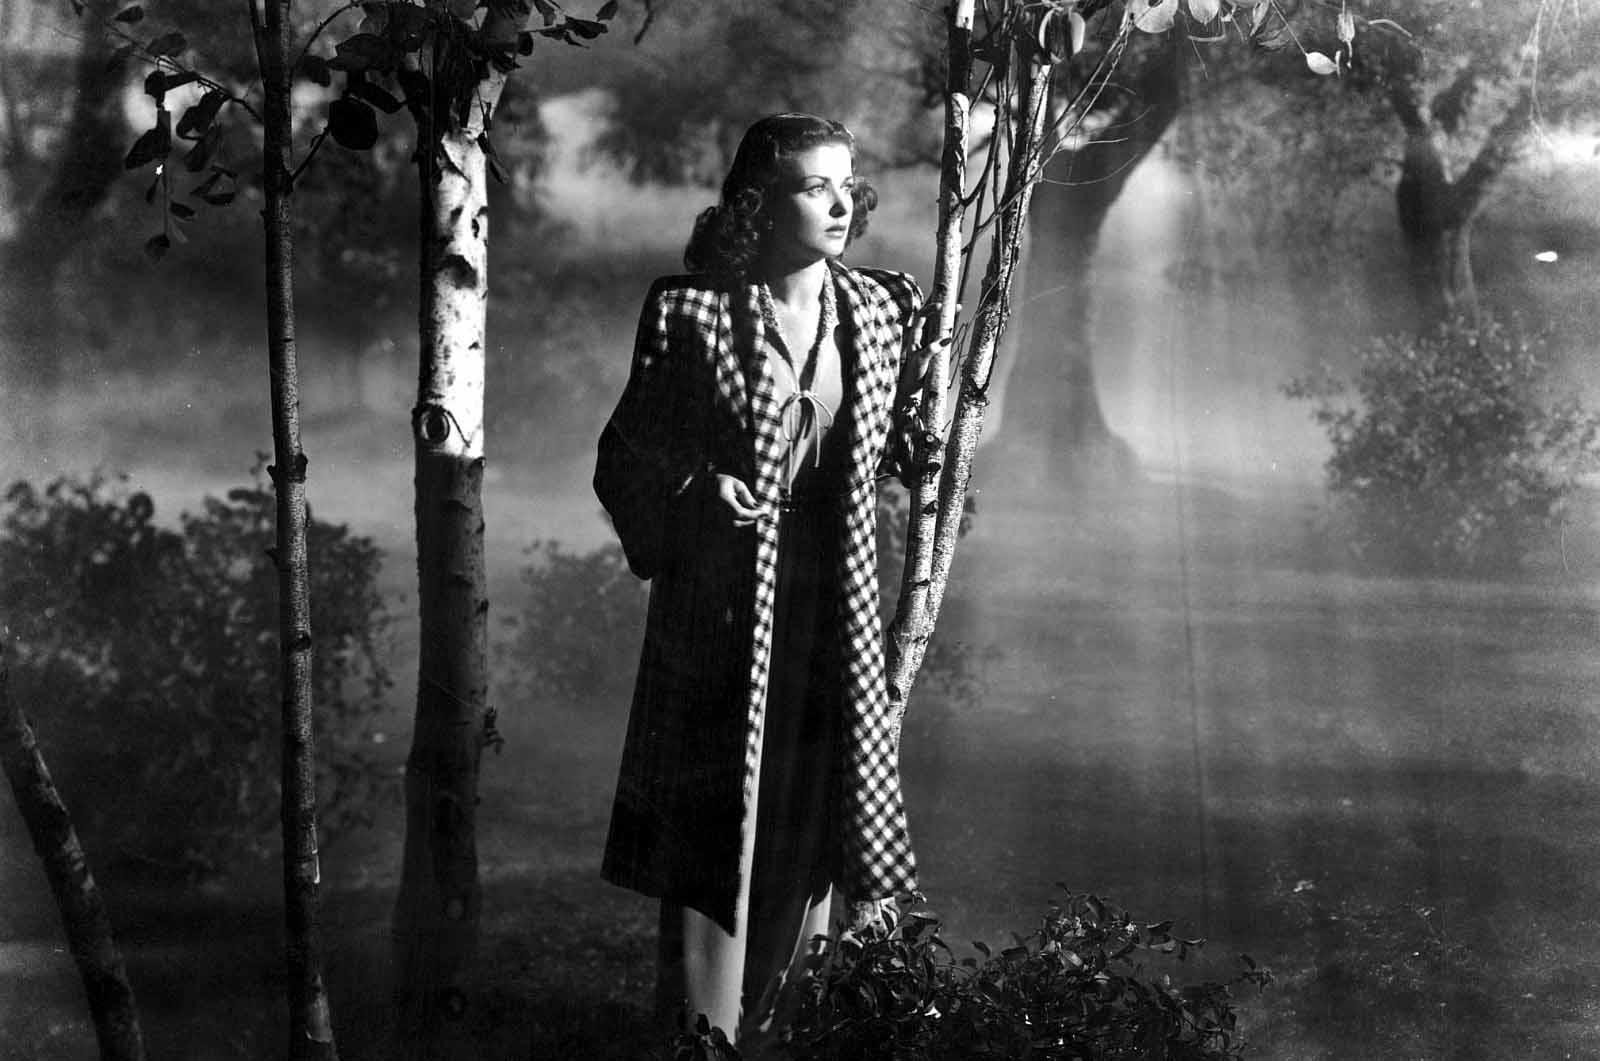 Dietro la porta chiusa - Fritz Lang